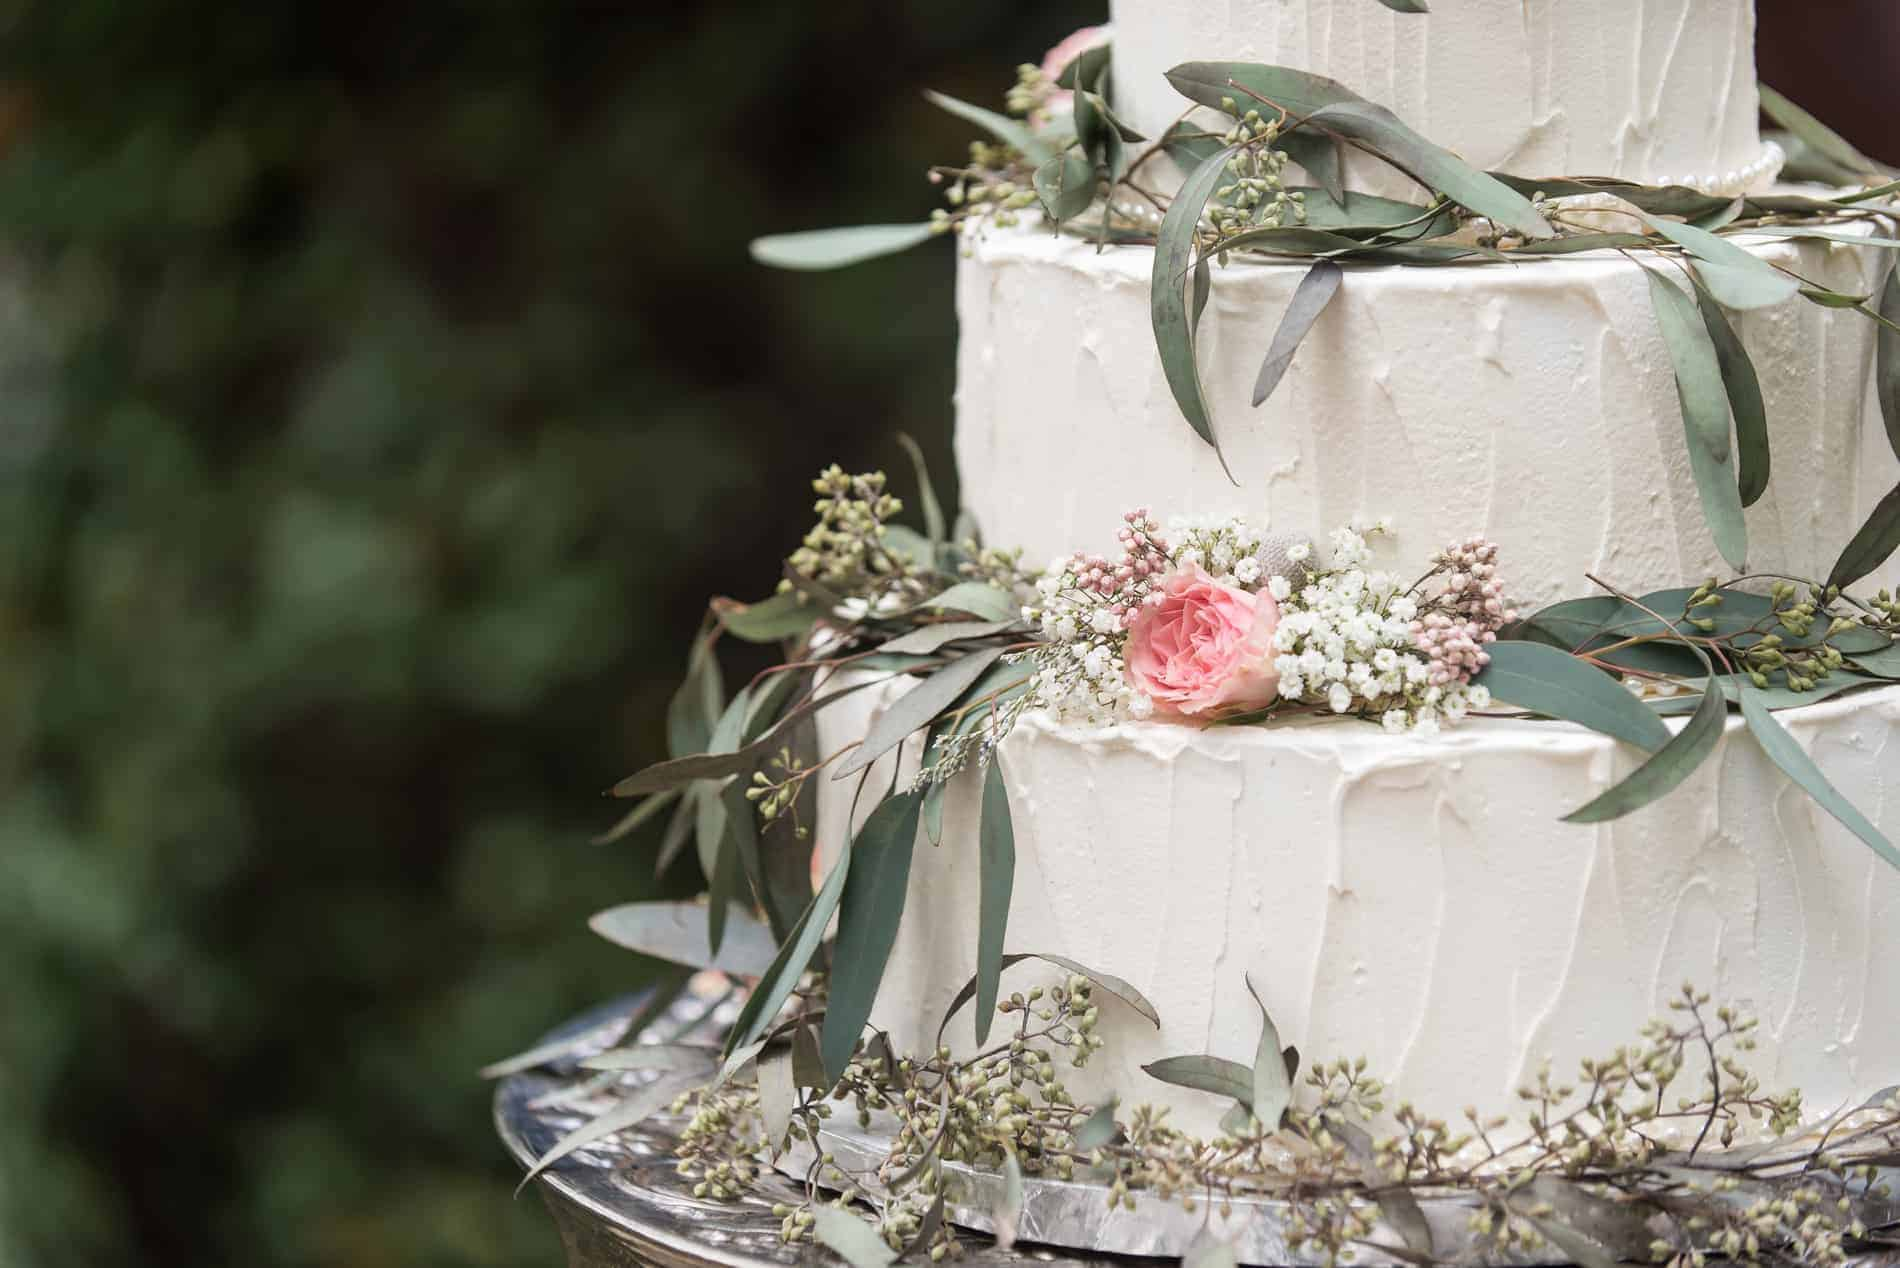 Wedding Cake Provided by Cake Designers